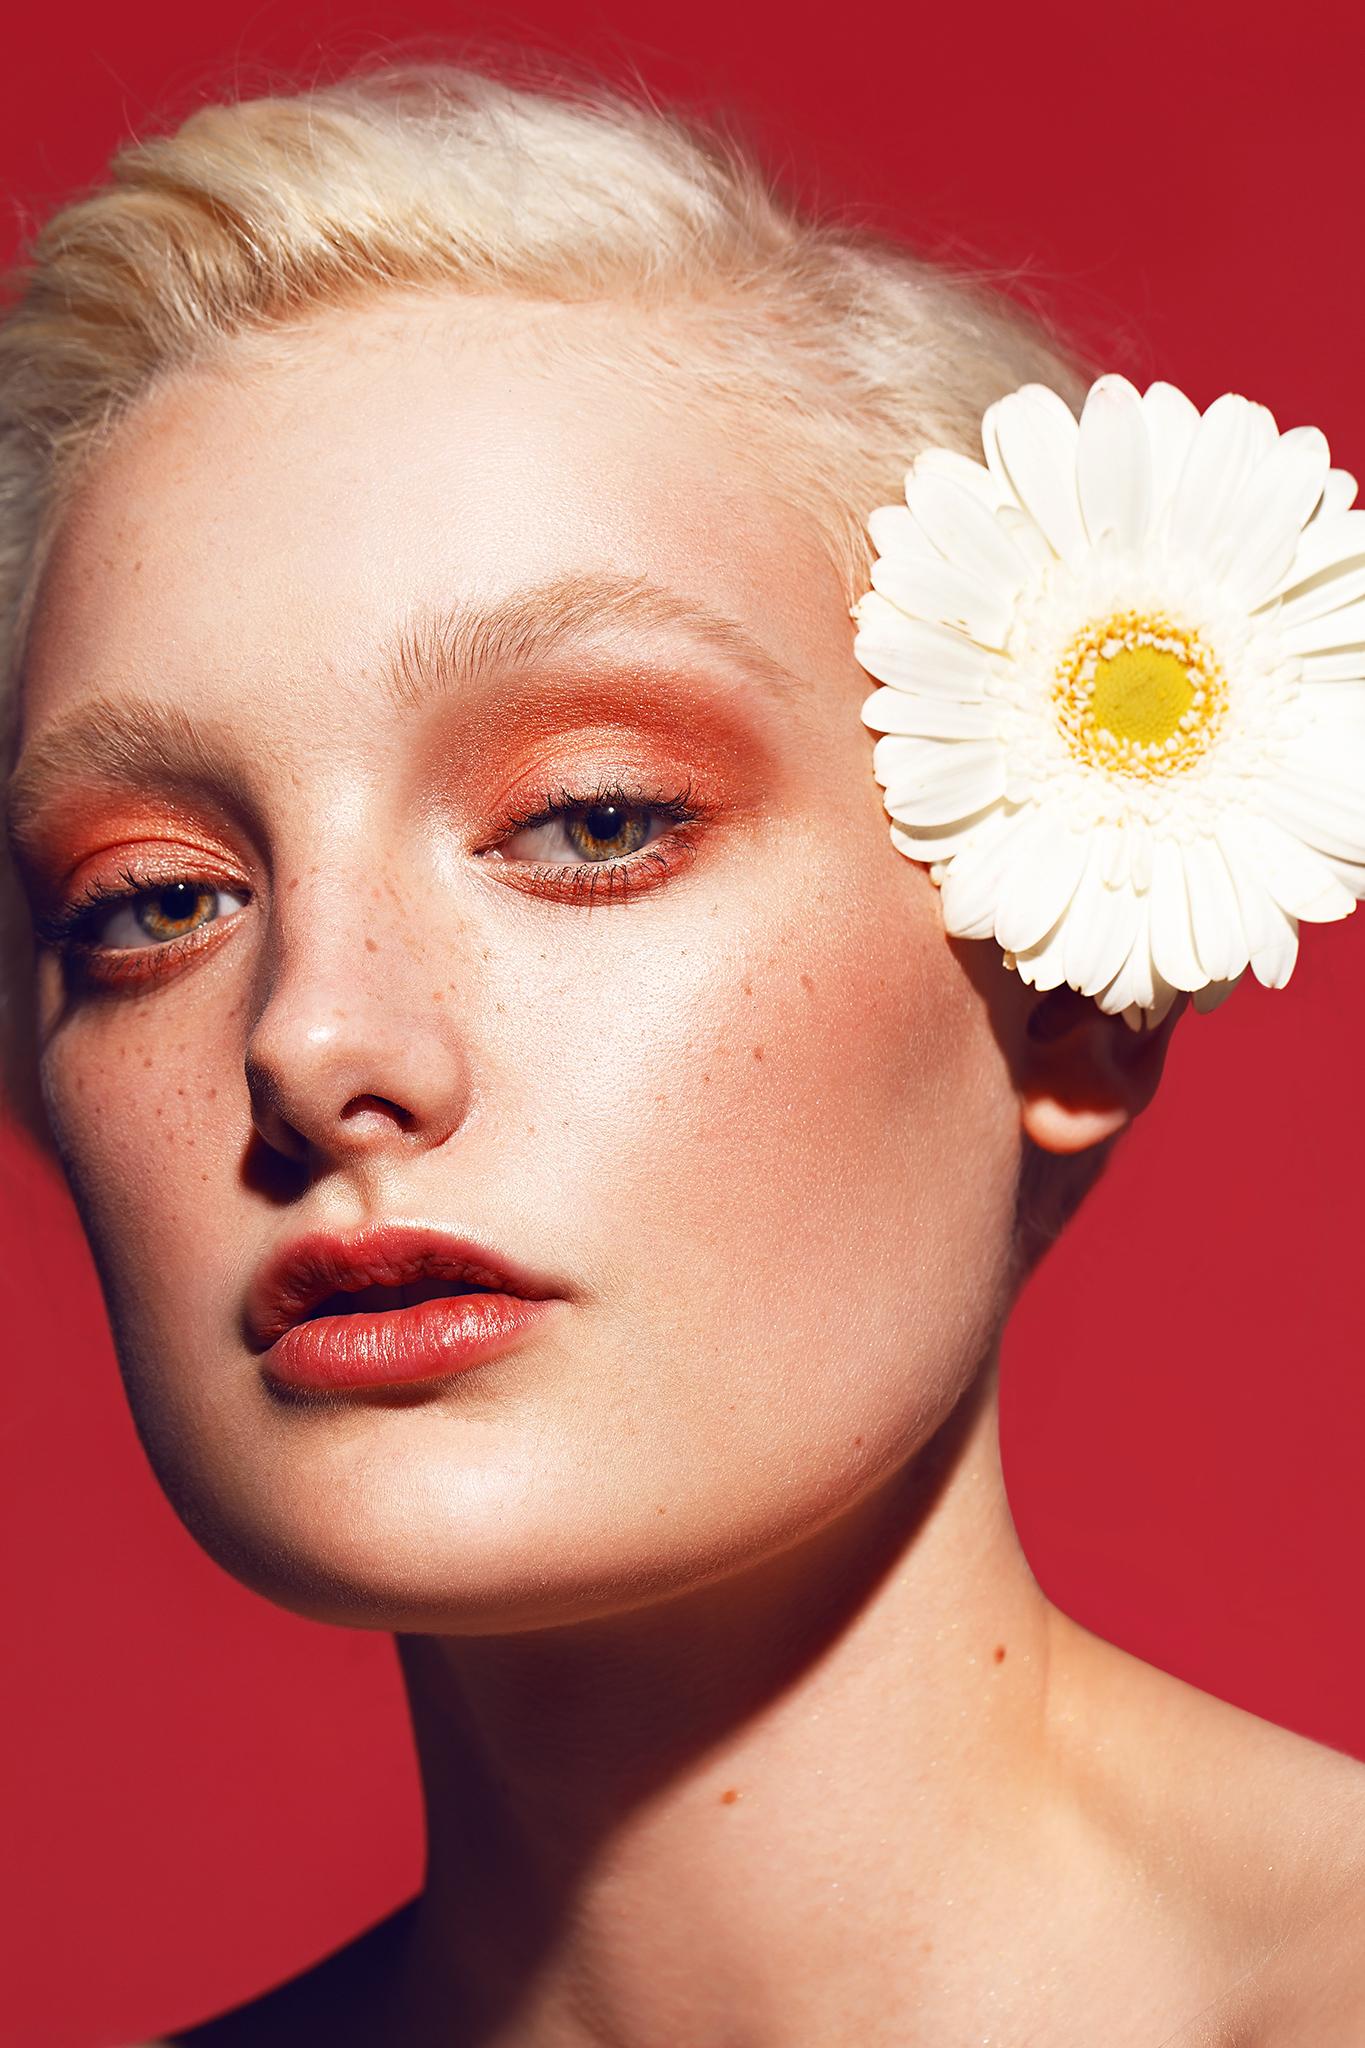 Beauty-Photography-by-beauty-Photographer-Dana-Cole-Red-makeup-fashion-model-heartbreak-models-sunflower-profoto-blonde-model-red-lips-beauty-photo-colorful-makeup.jpg